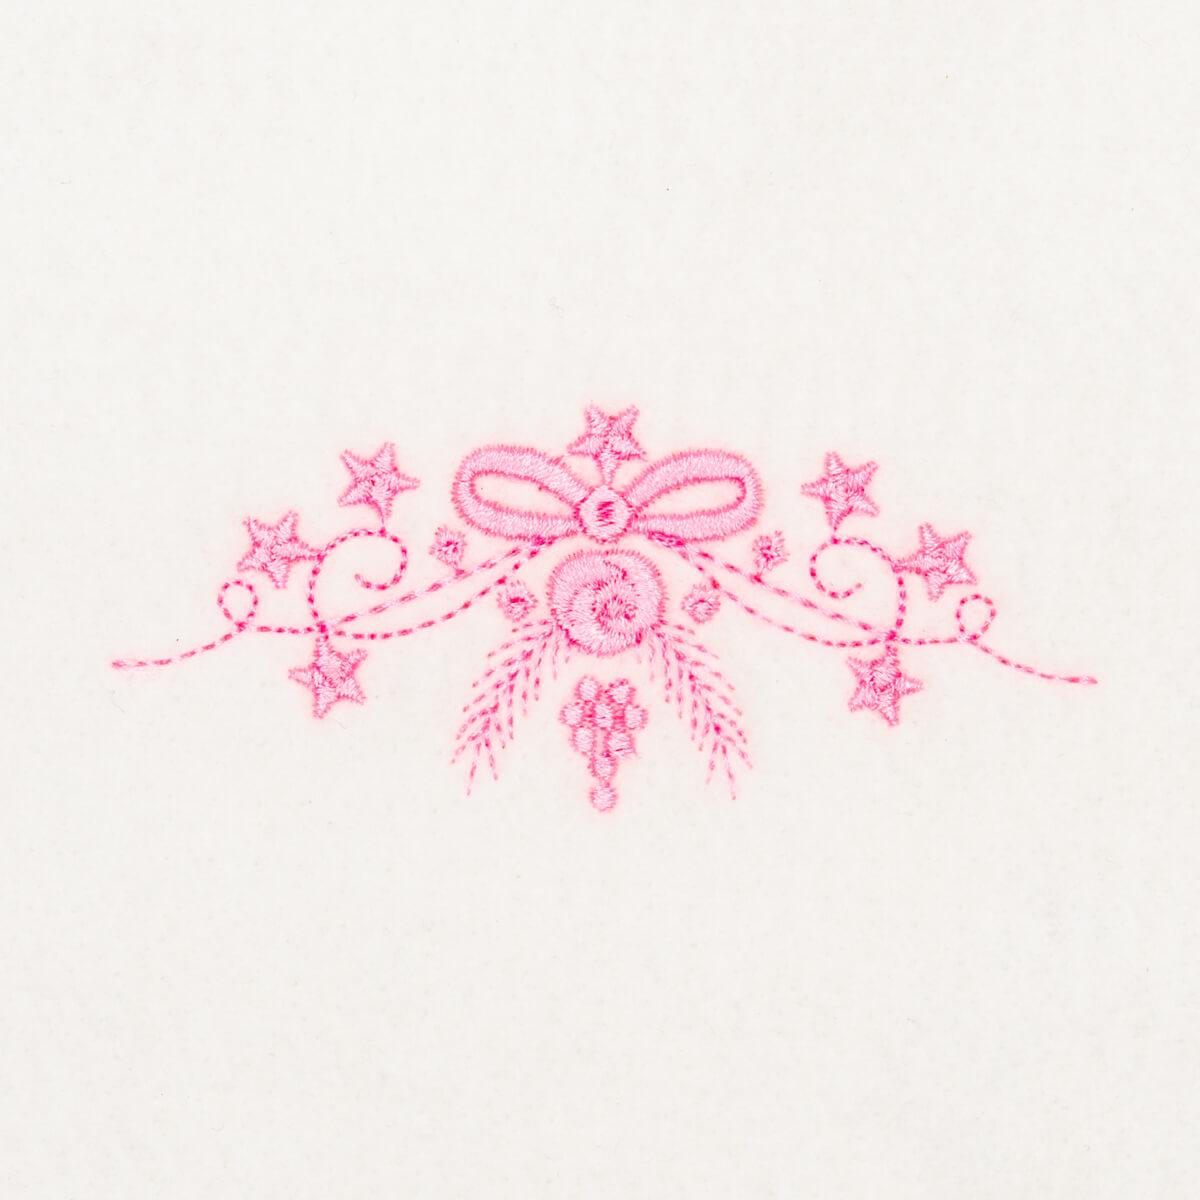 Matriz de bordado floral 375